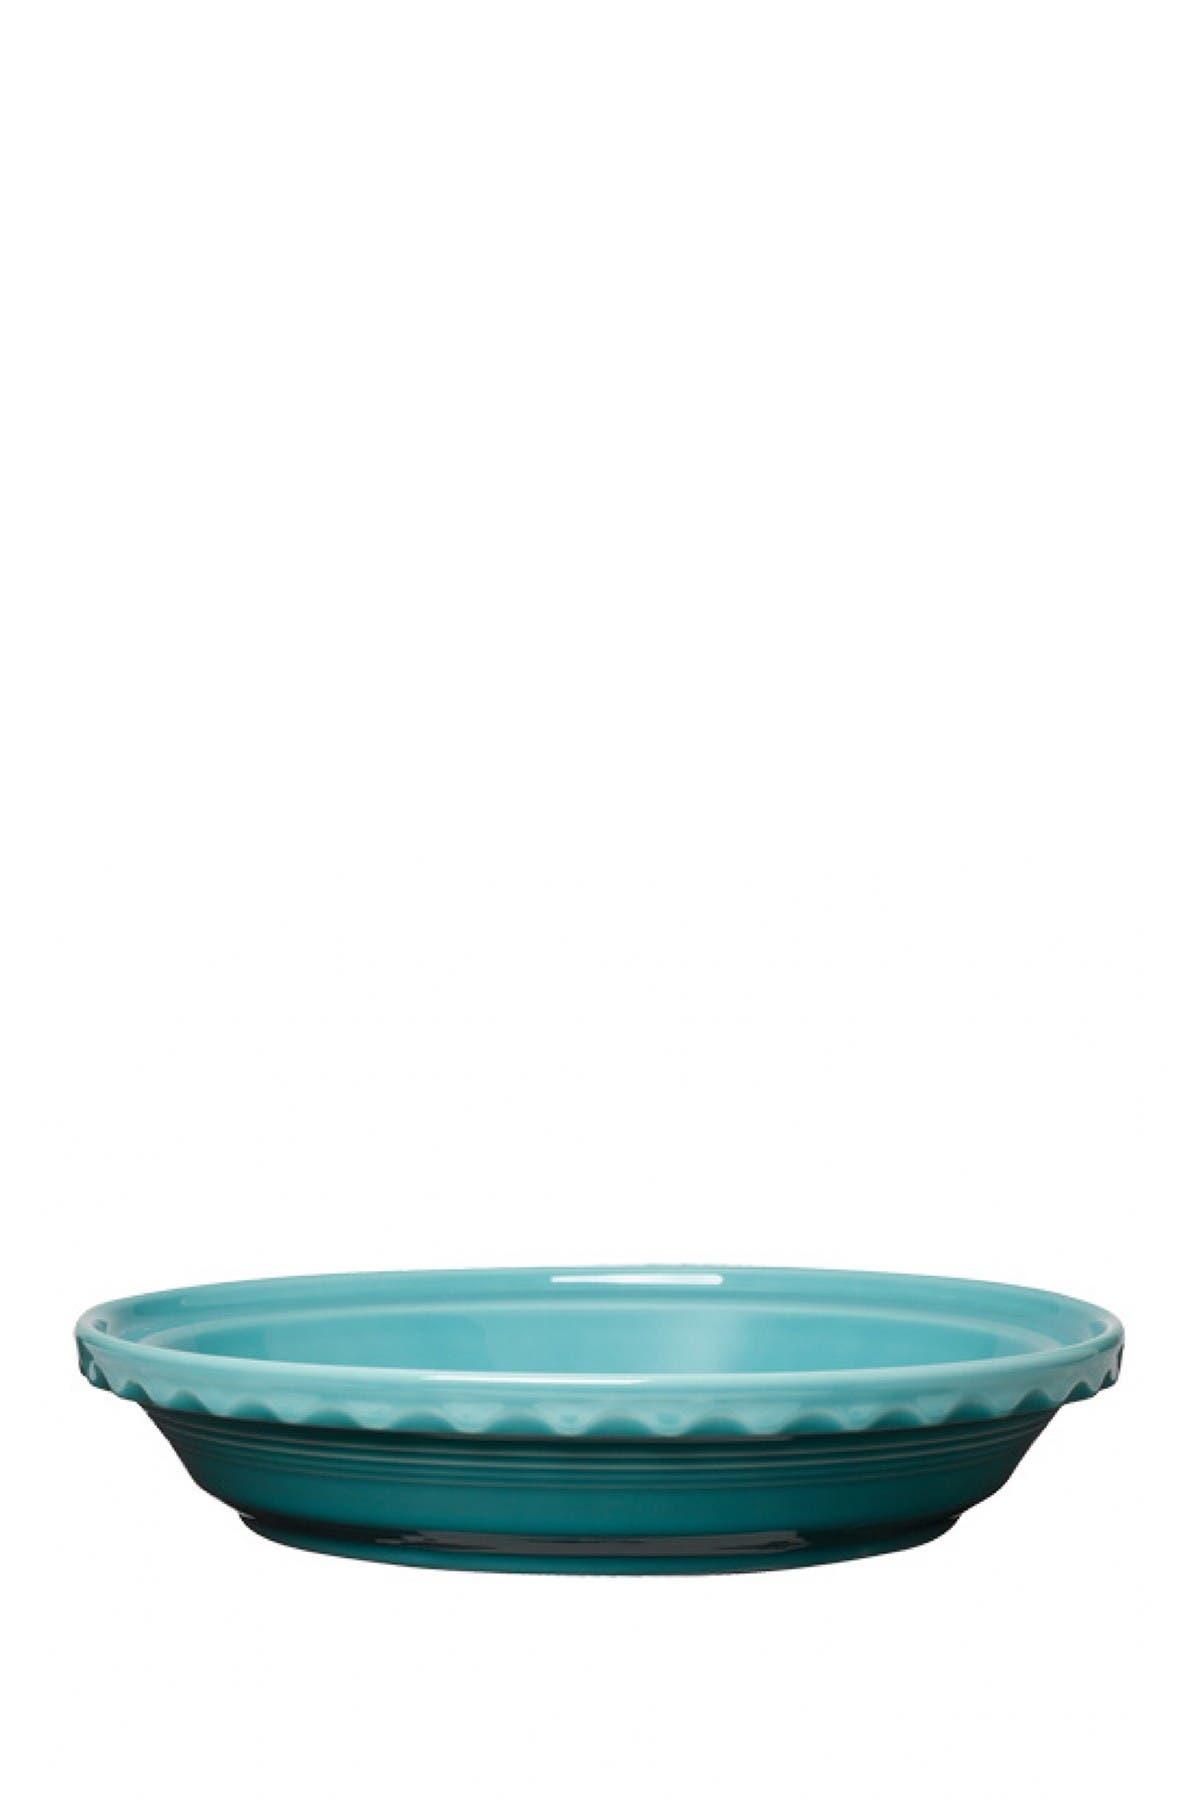 Image of Fiesta Tableware Company 44 oz. Deep Dish Pie Baker